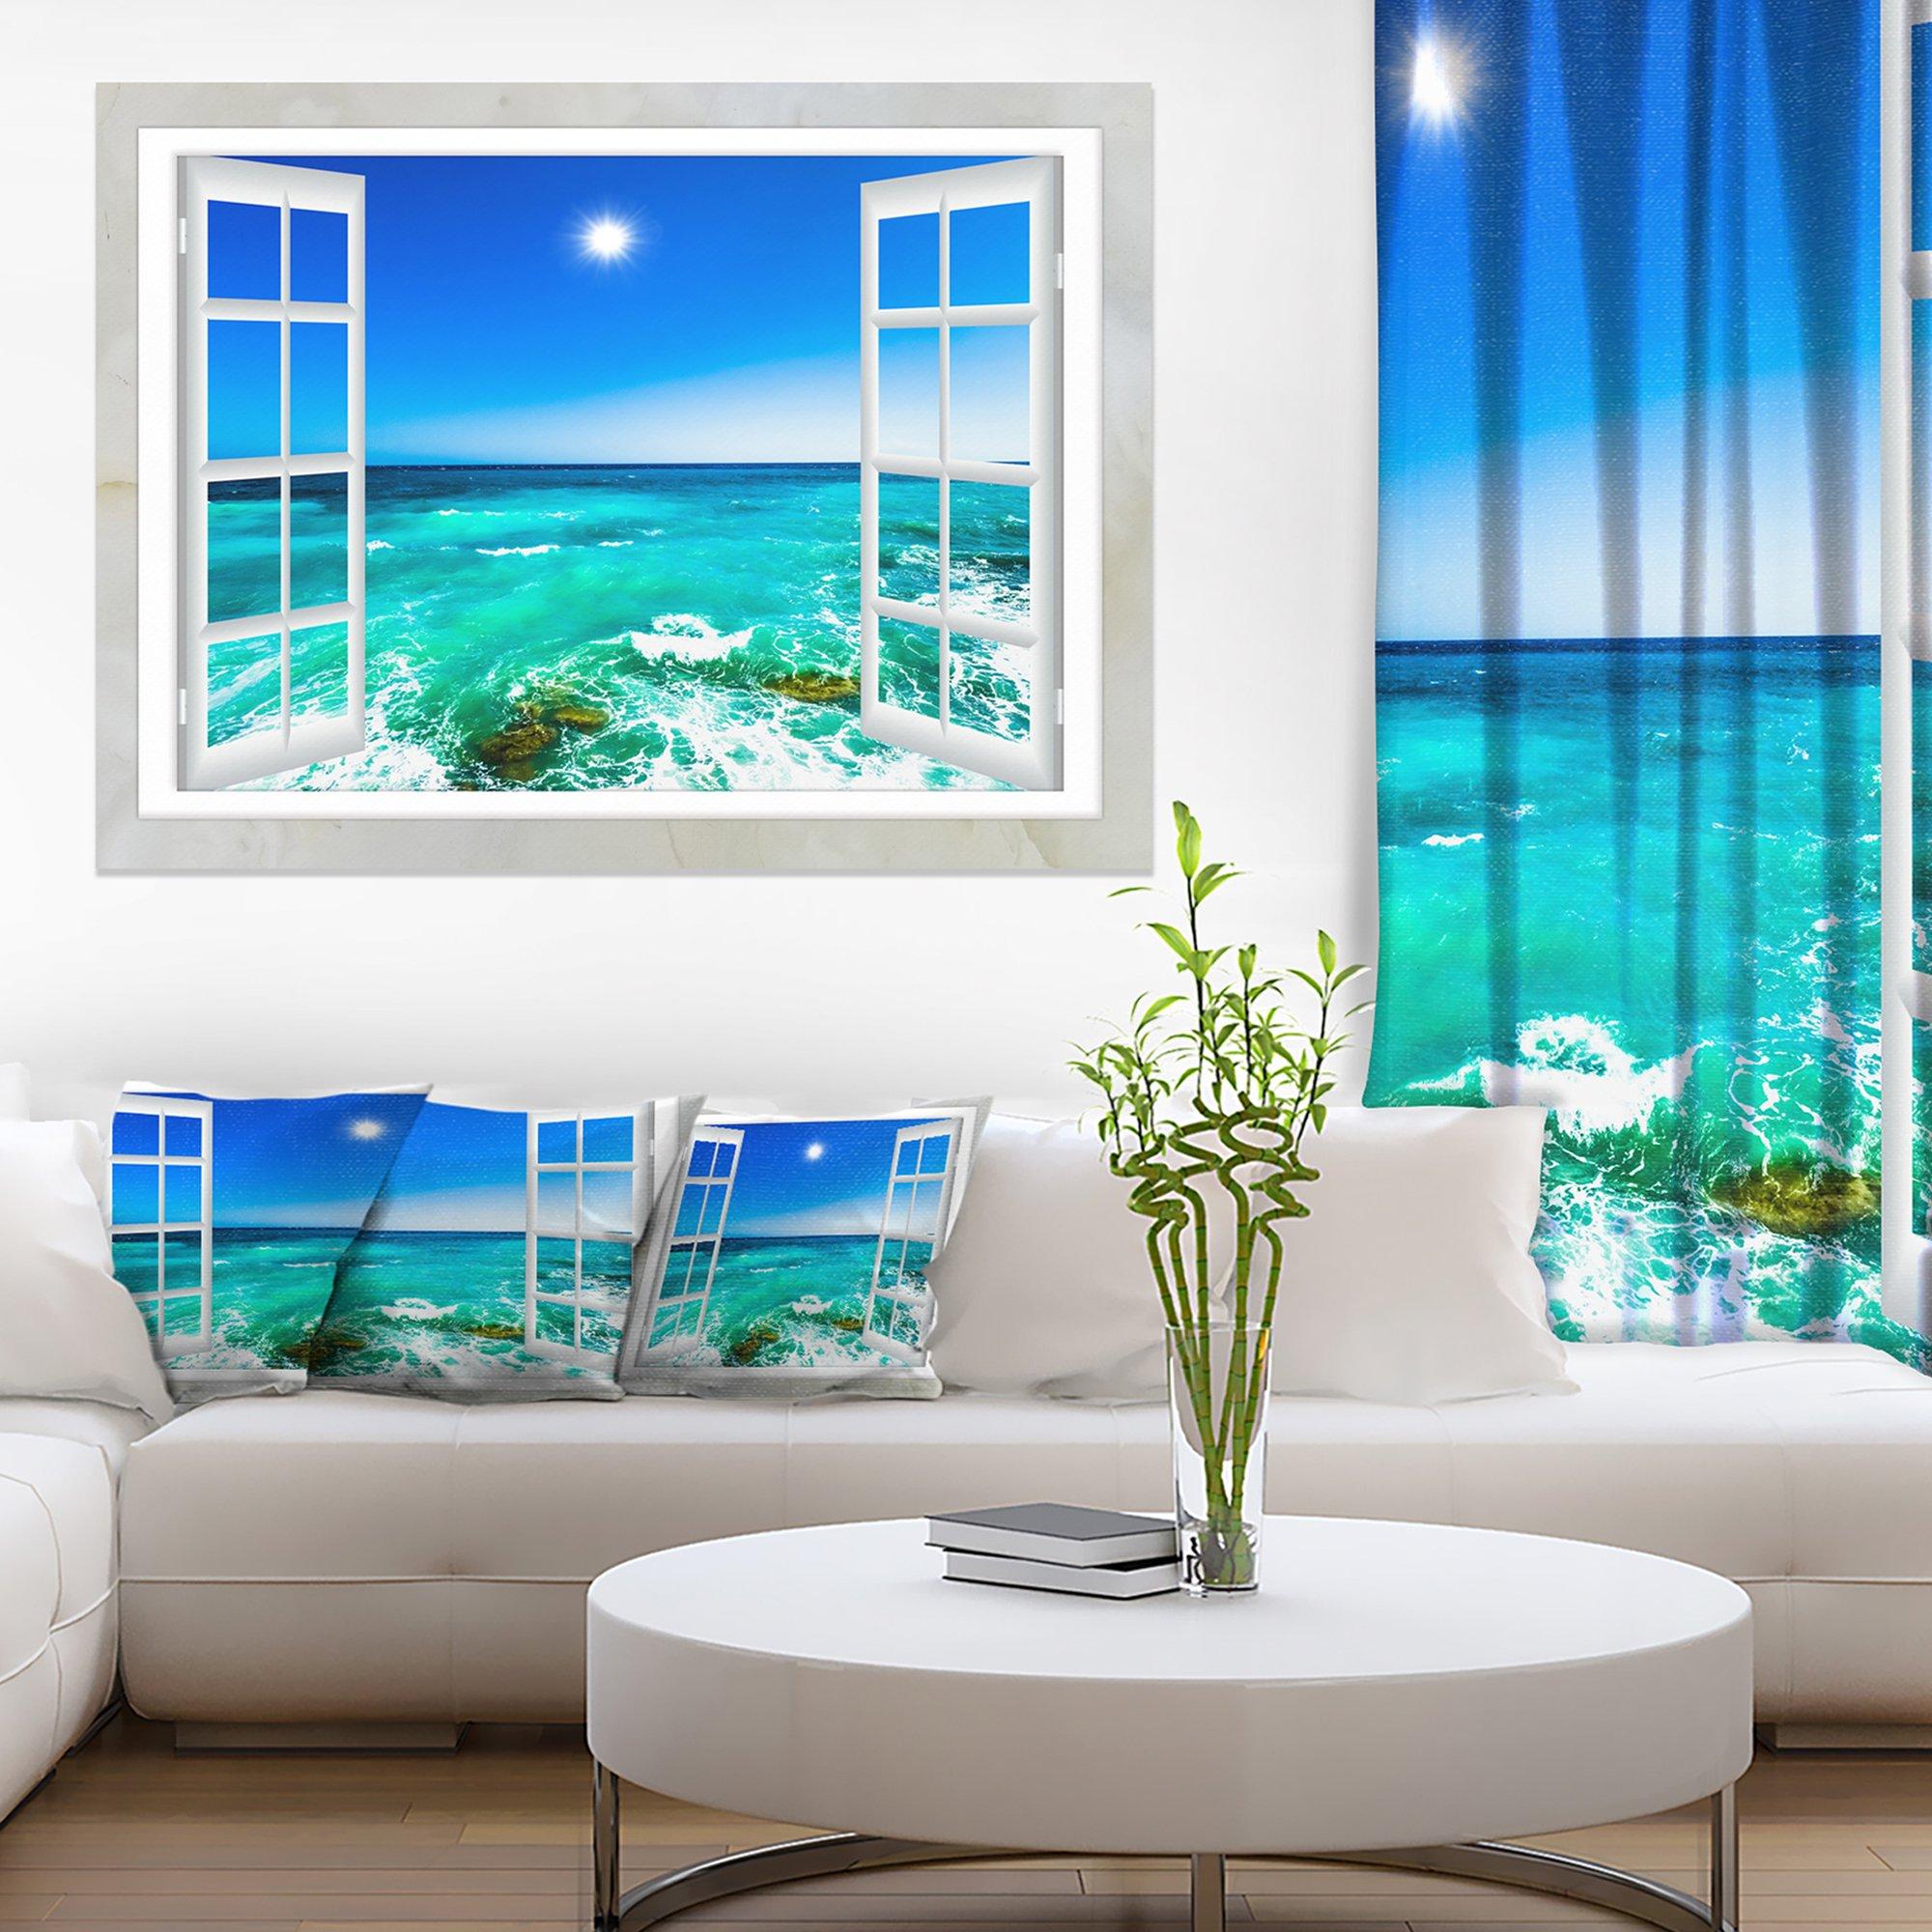 Open Window to Wavy Ocean Extra Large Seashore Canvas Art